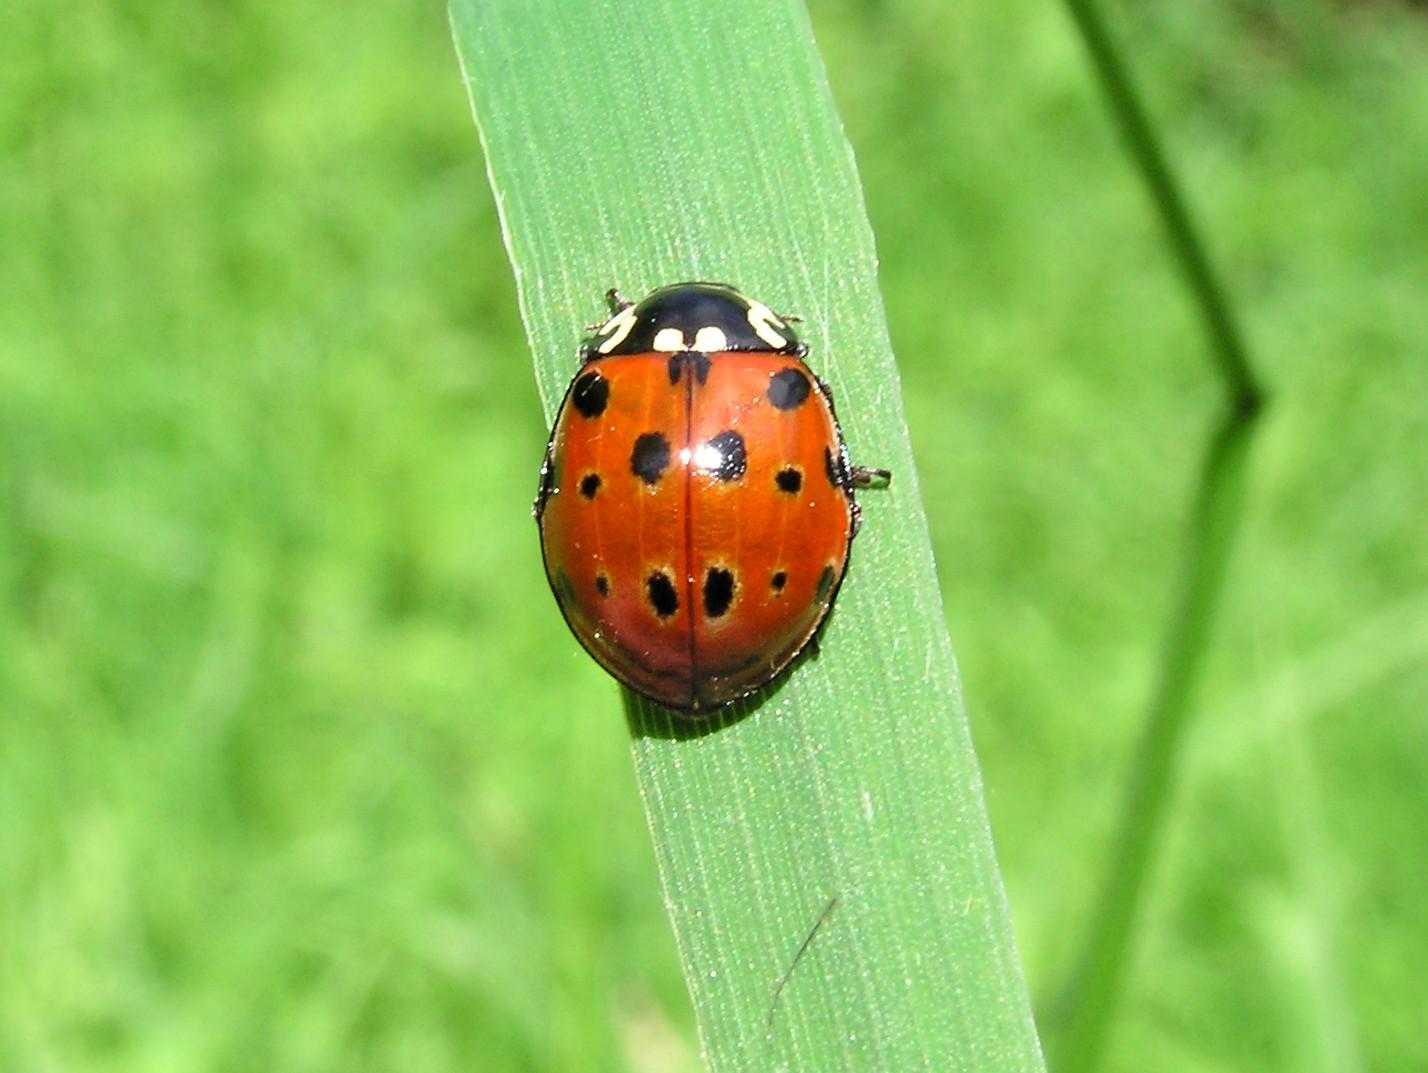 Anatis ocellata, the Eyed Ladybird is Britain's largest ladybird.